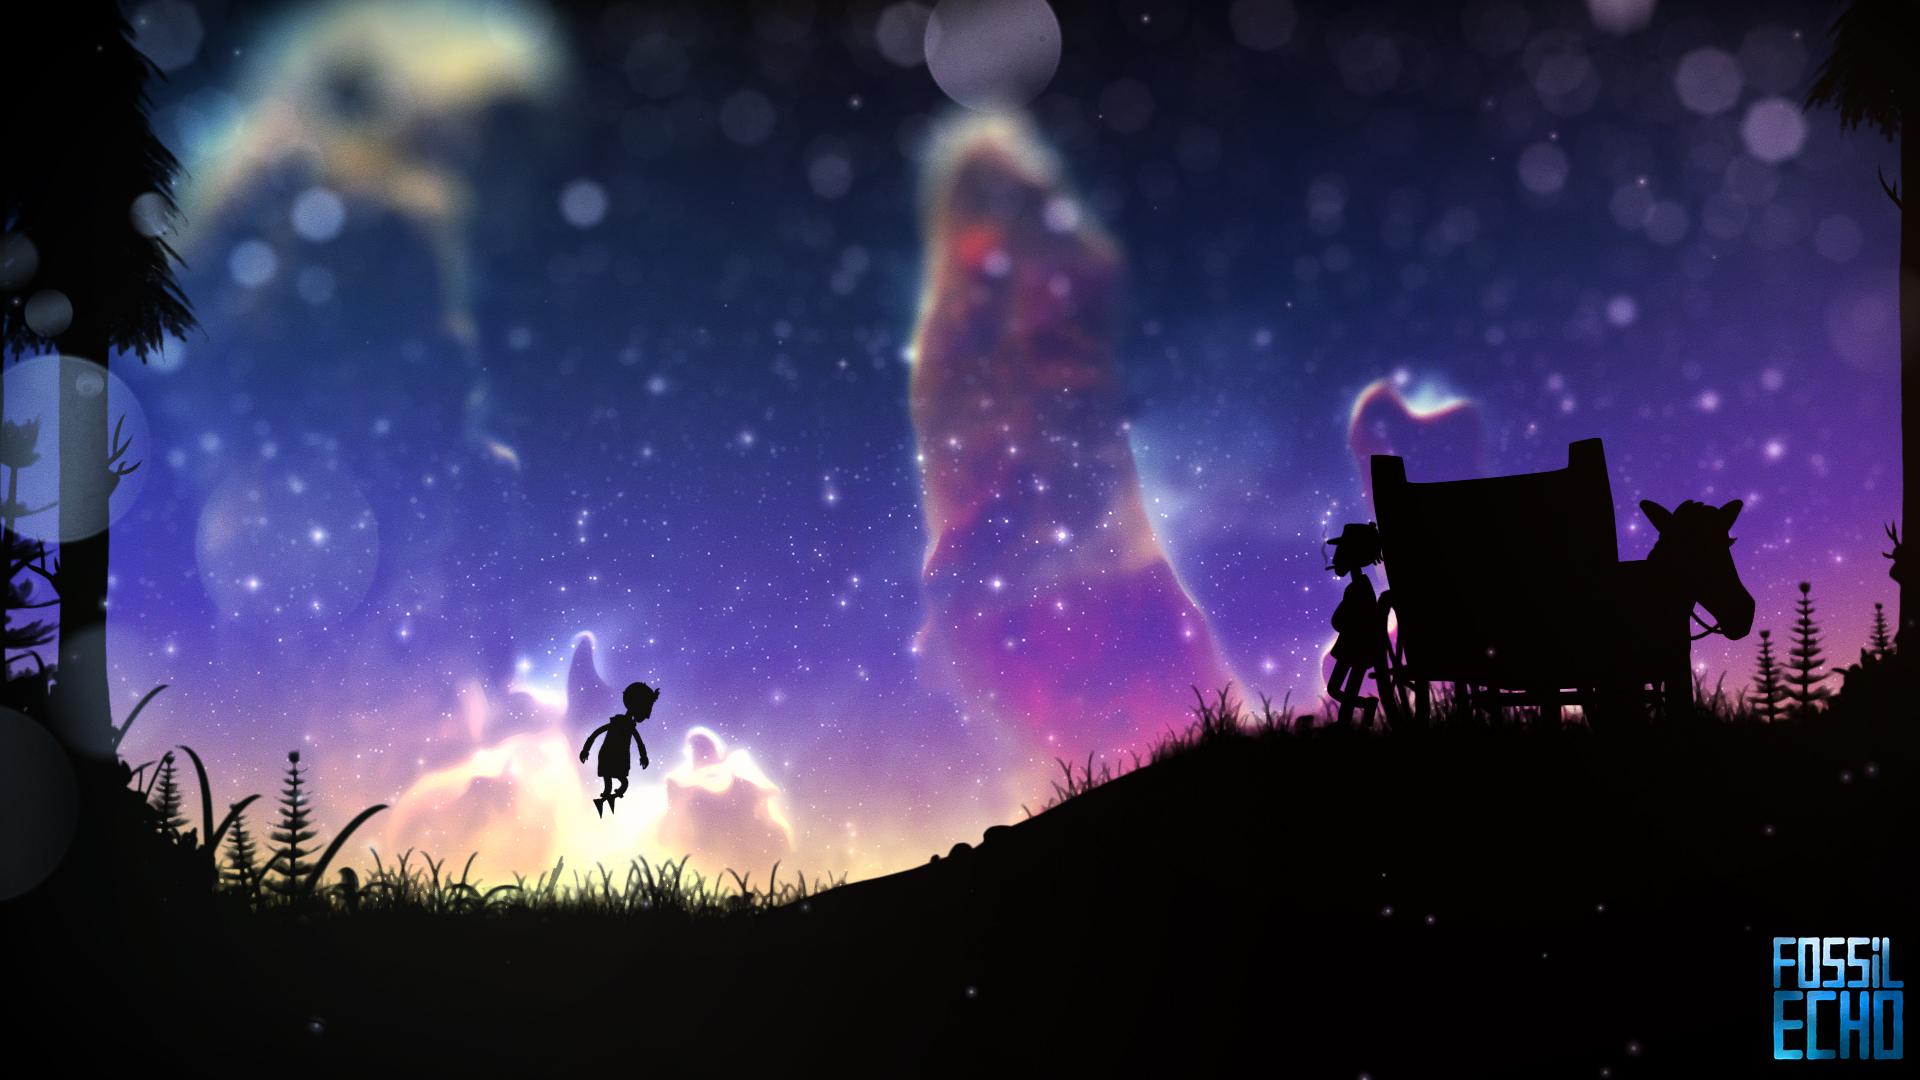 Fossil Echo screenshot 3